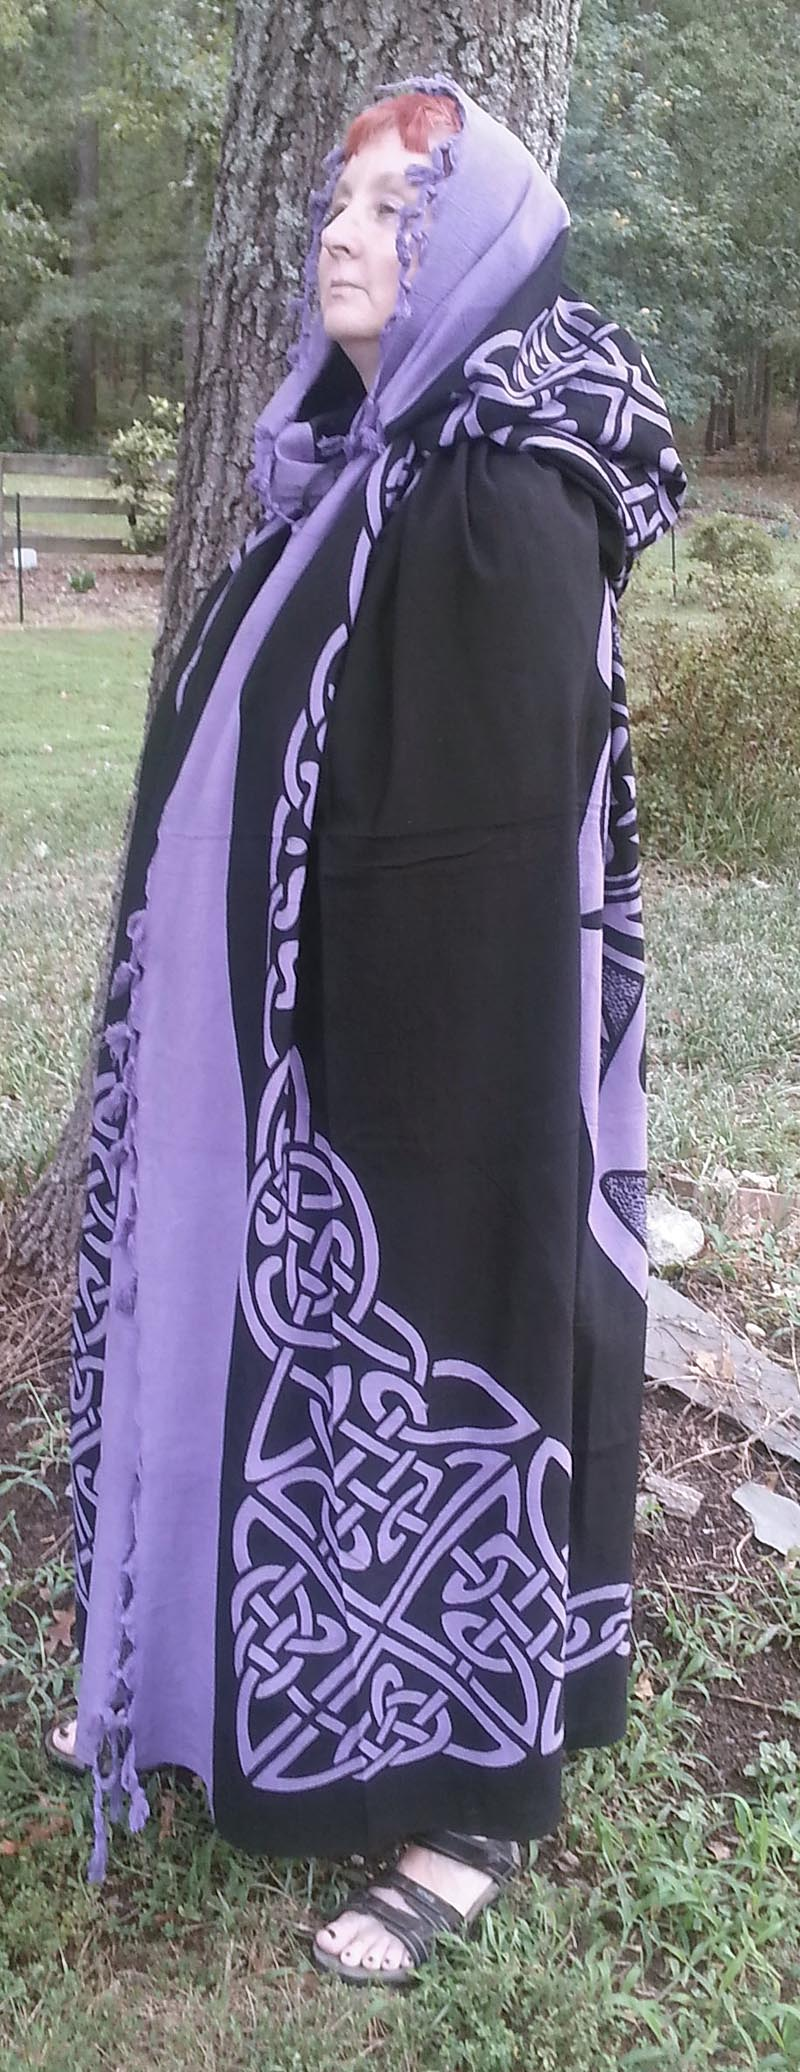 Celtic Knot Cotton Cape Purple On Black At Irishshop Com